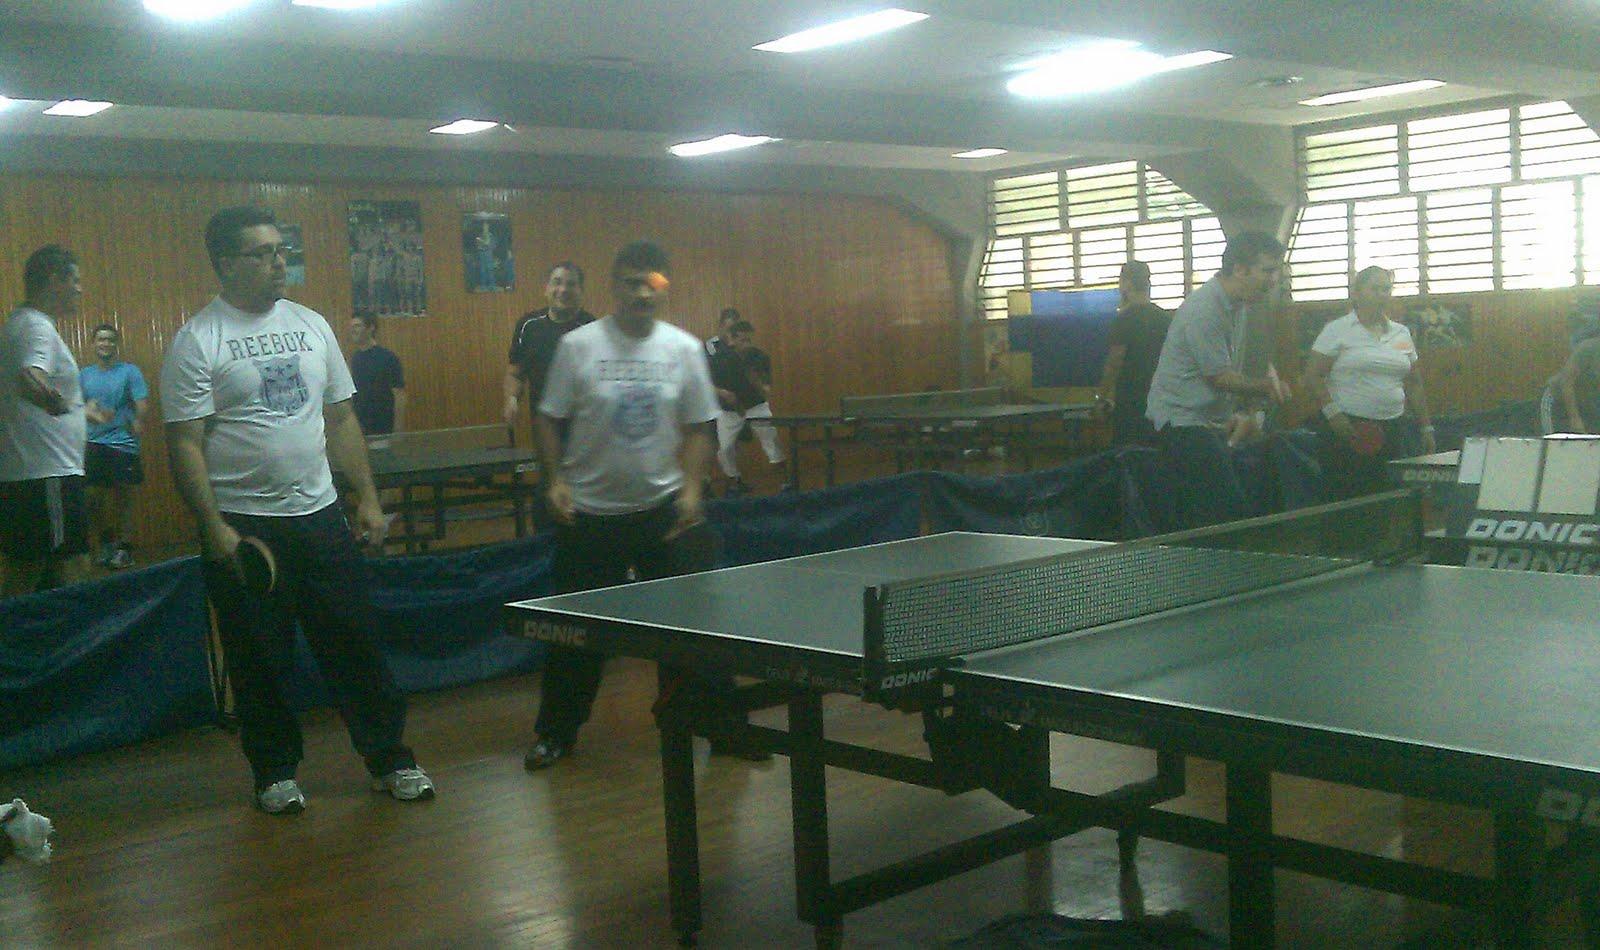 Vepica hoy torneo de tenis de mesa interempresas - Torneo tenis de mesa ...